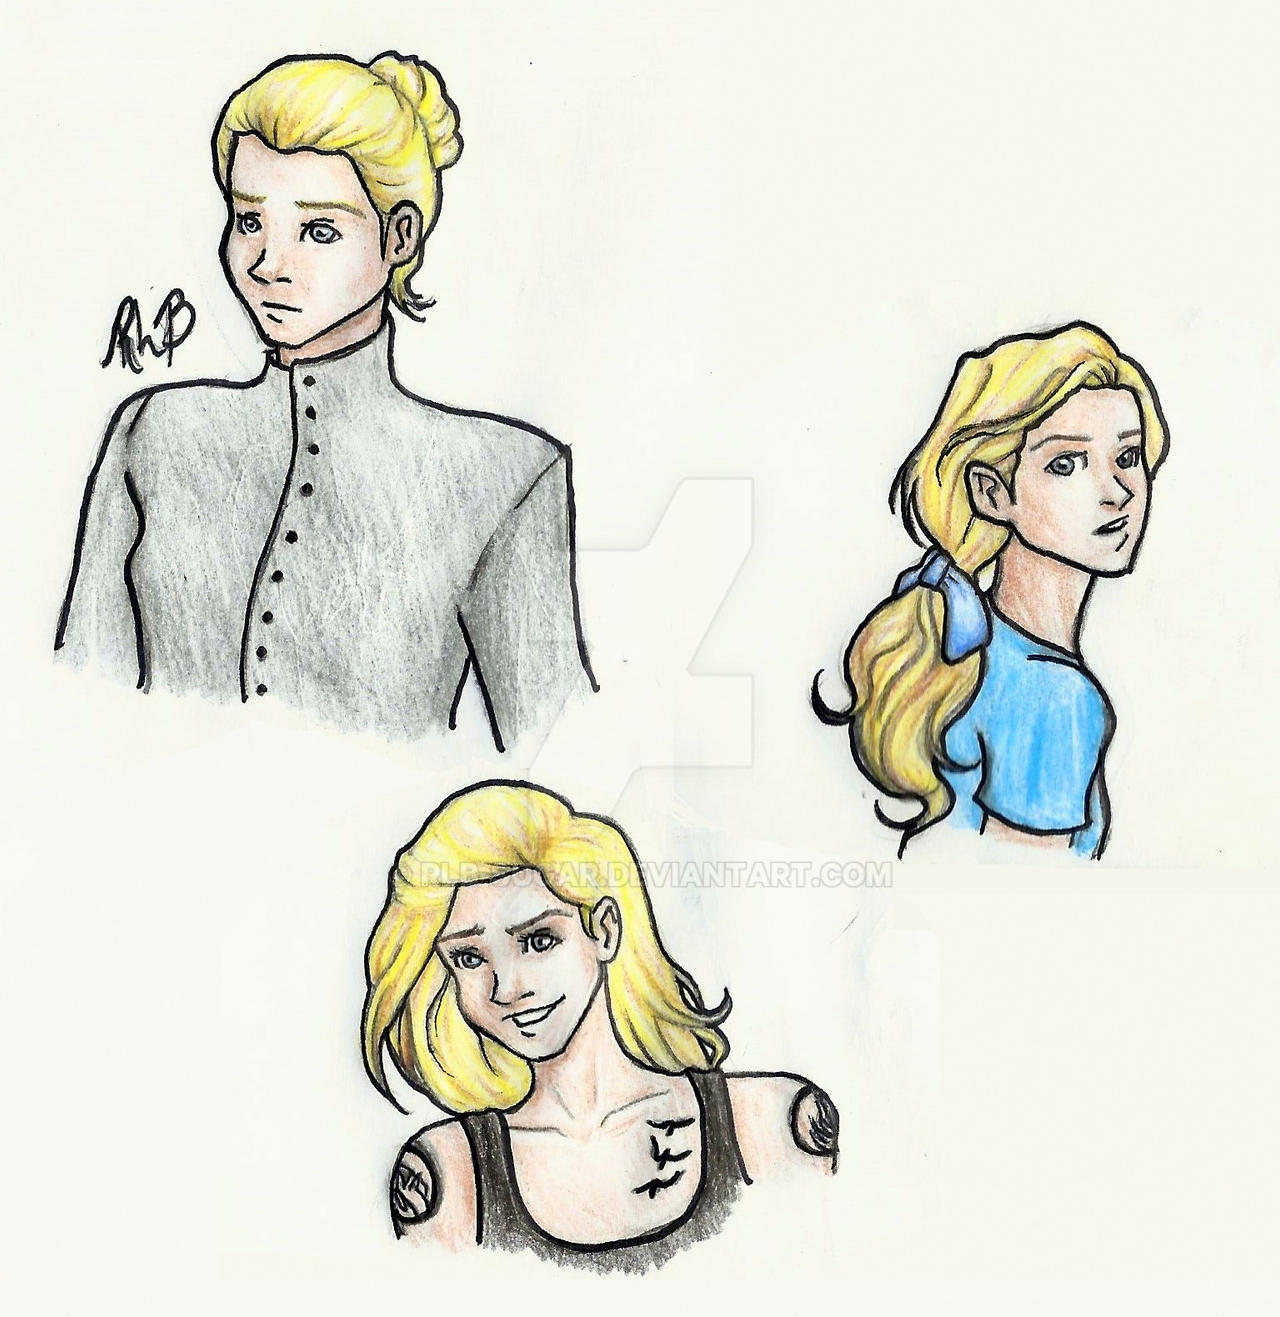 Not Dauntless, not Abnegation, not Erudite. by RLB-SUGAR